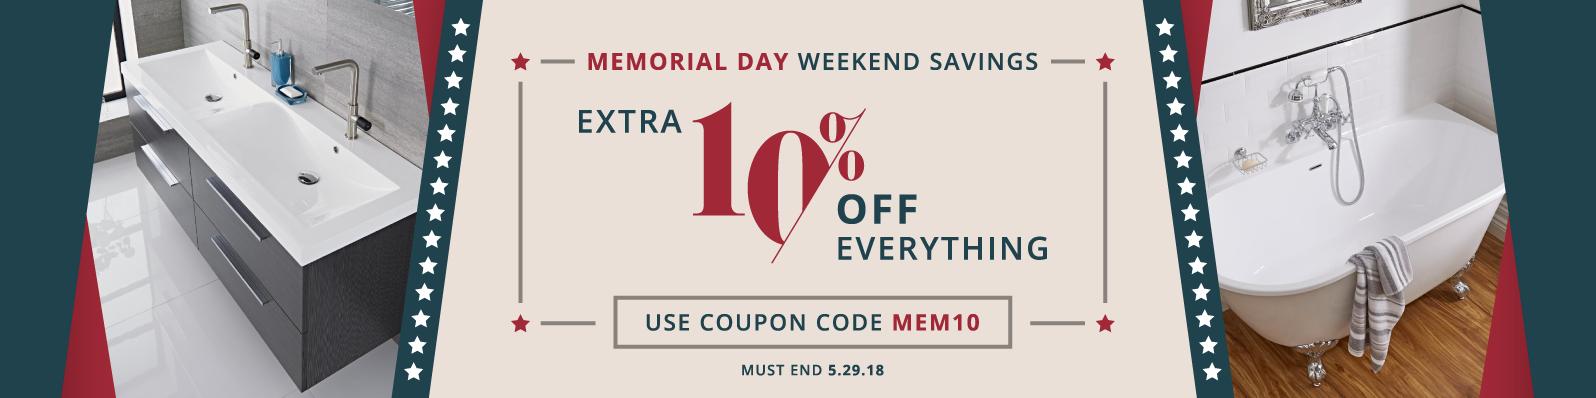 Extra 10% off everything - Use coupon code MEM10